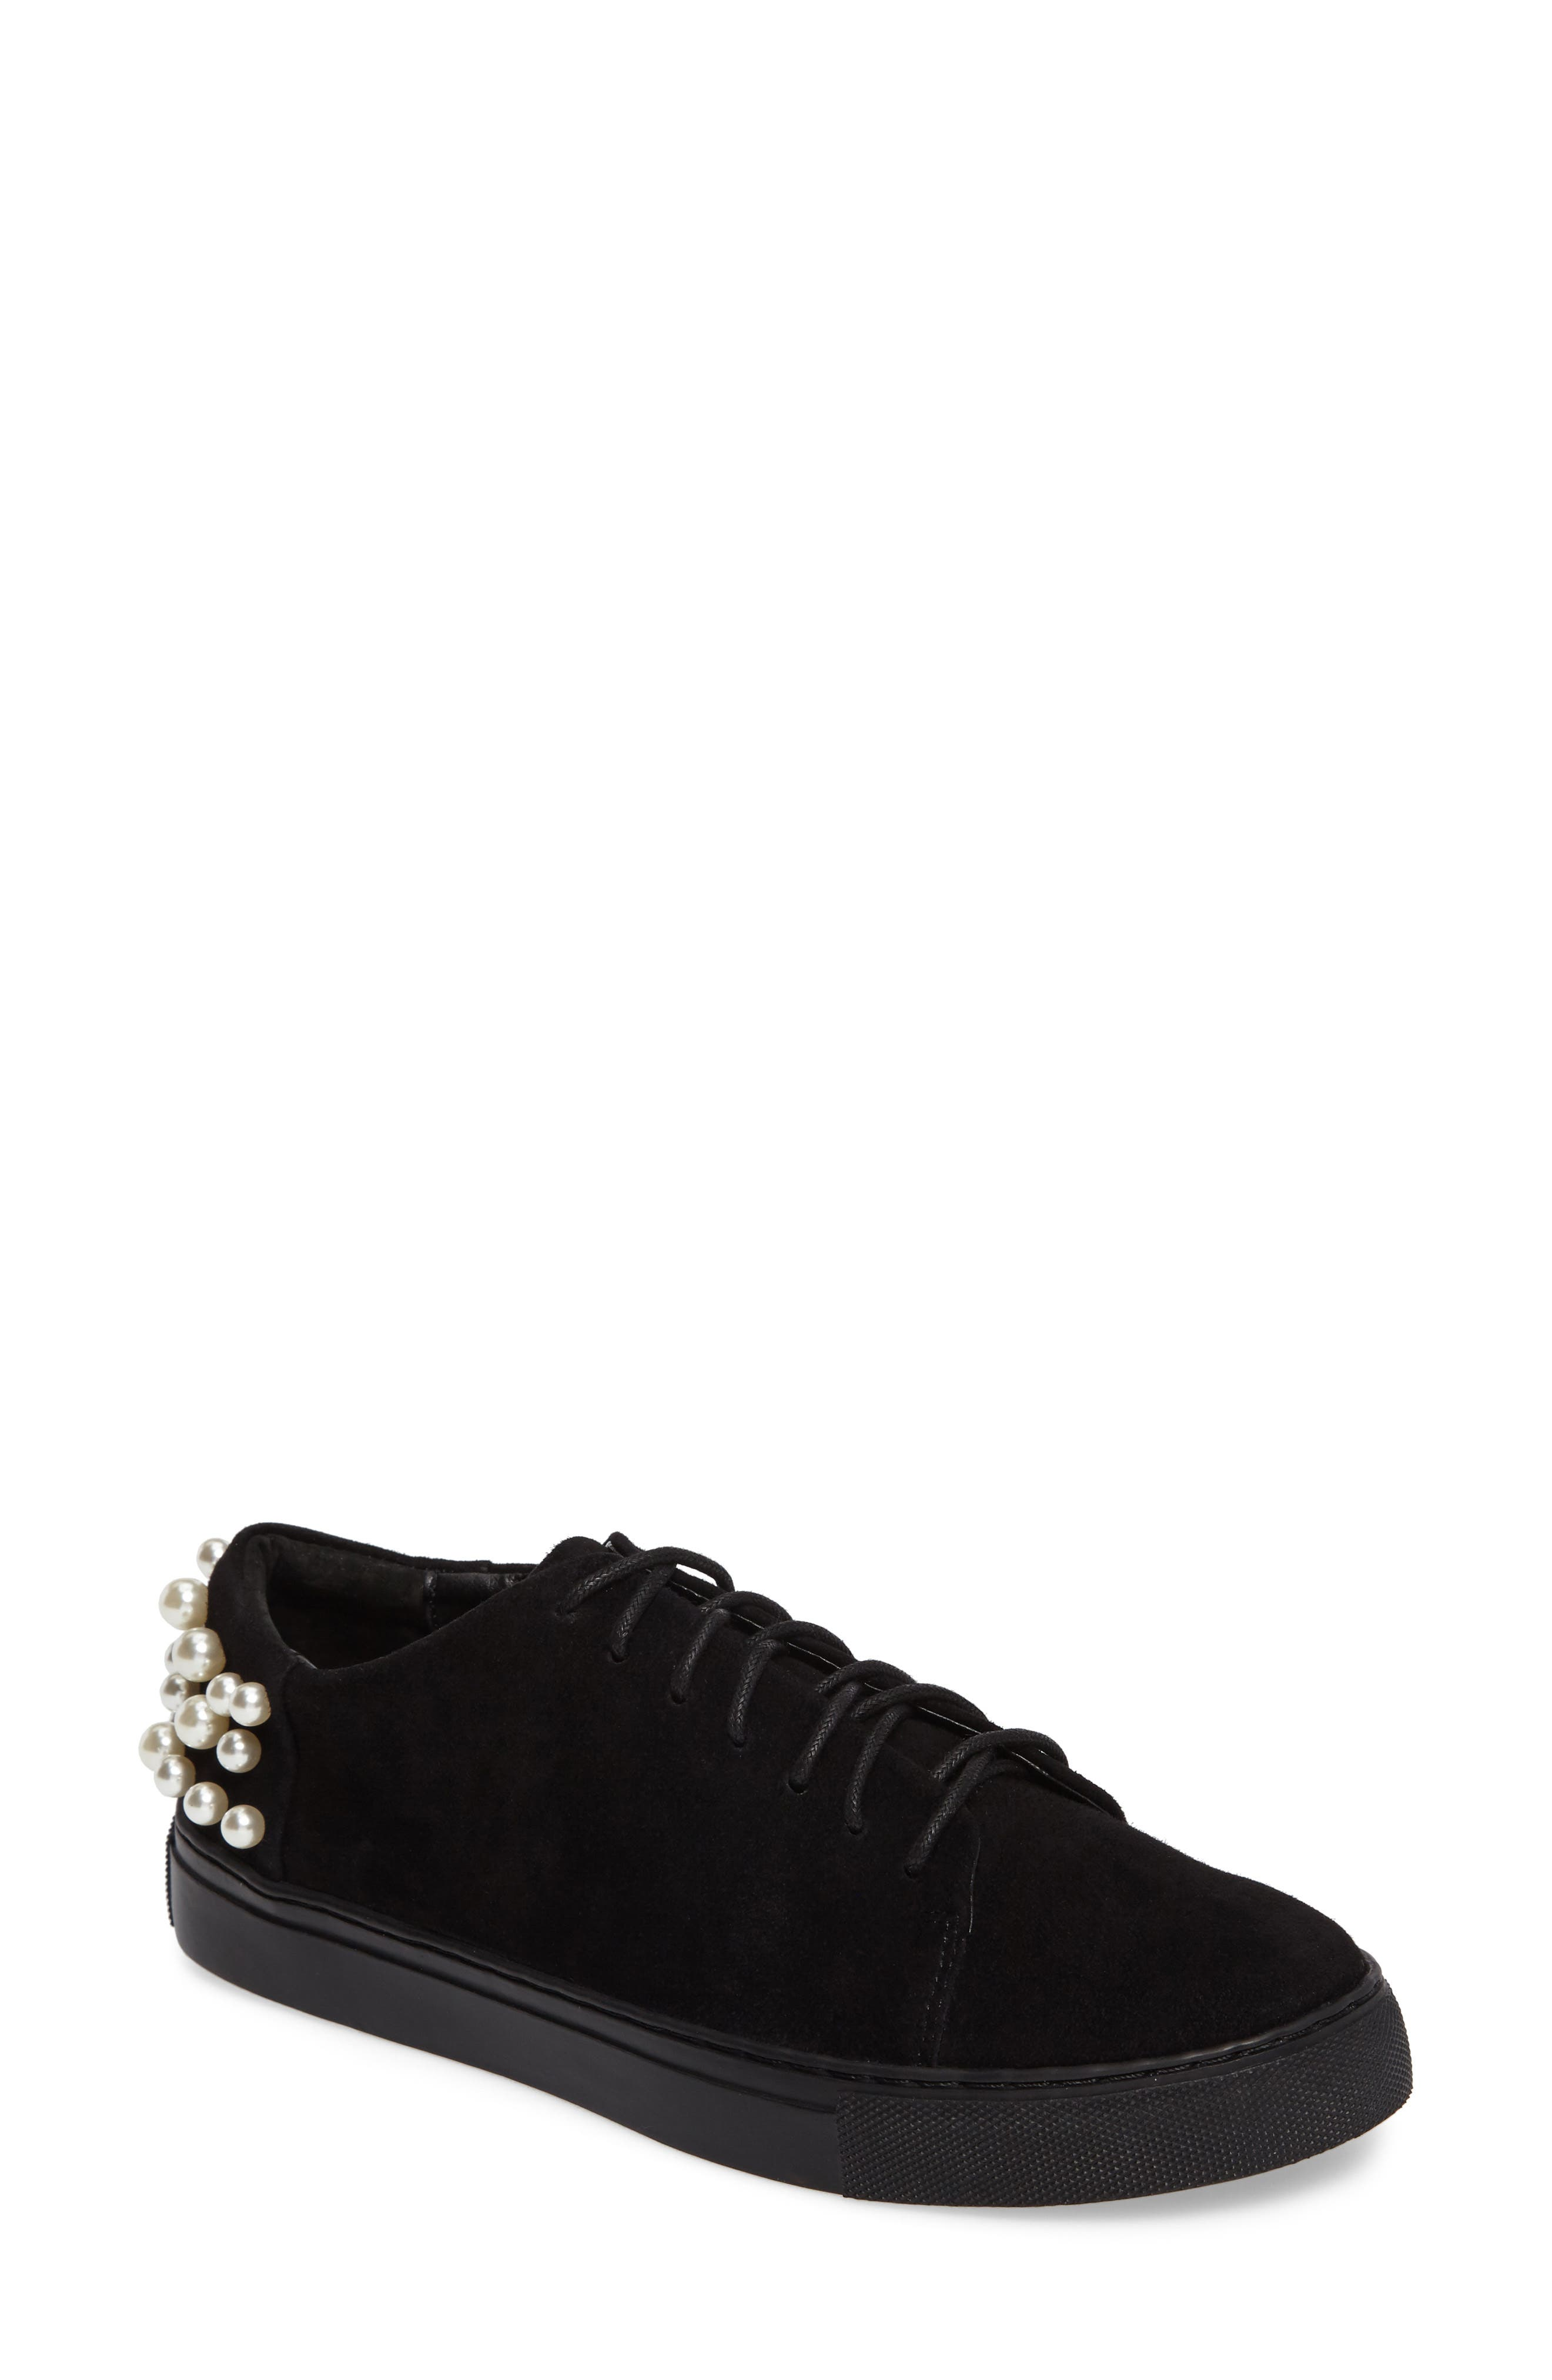 Haig Embellished Sneaker,                             Main thumbnail 1, color,                             001